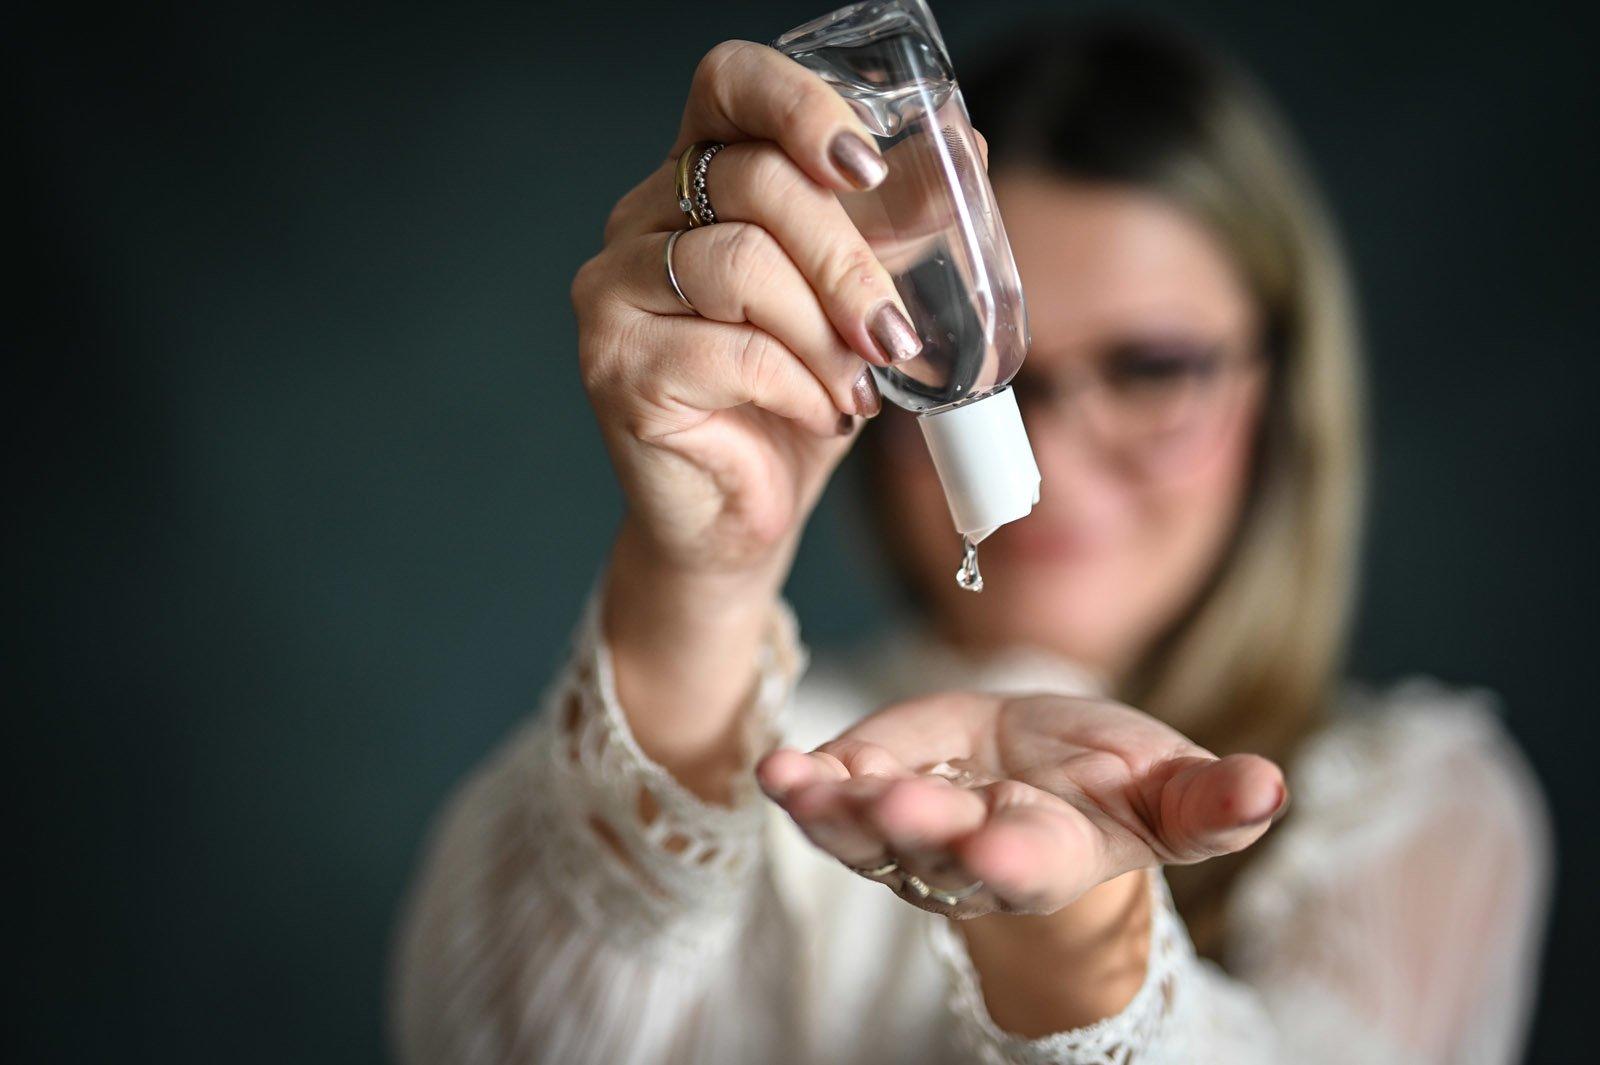 Korona antibakterie